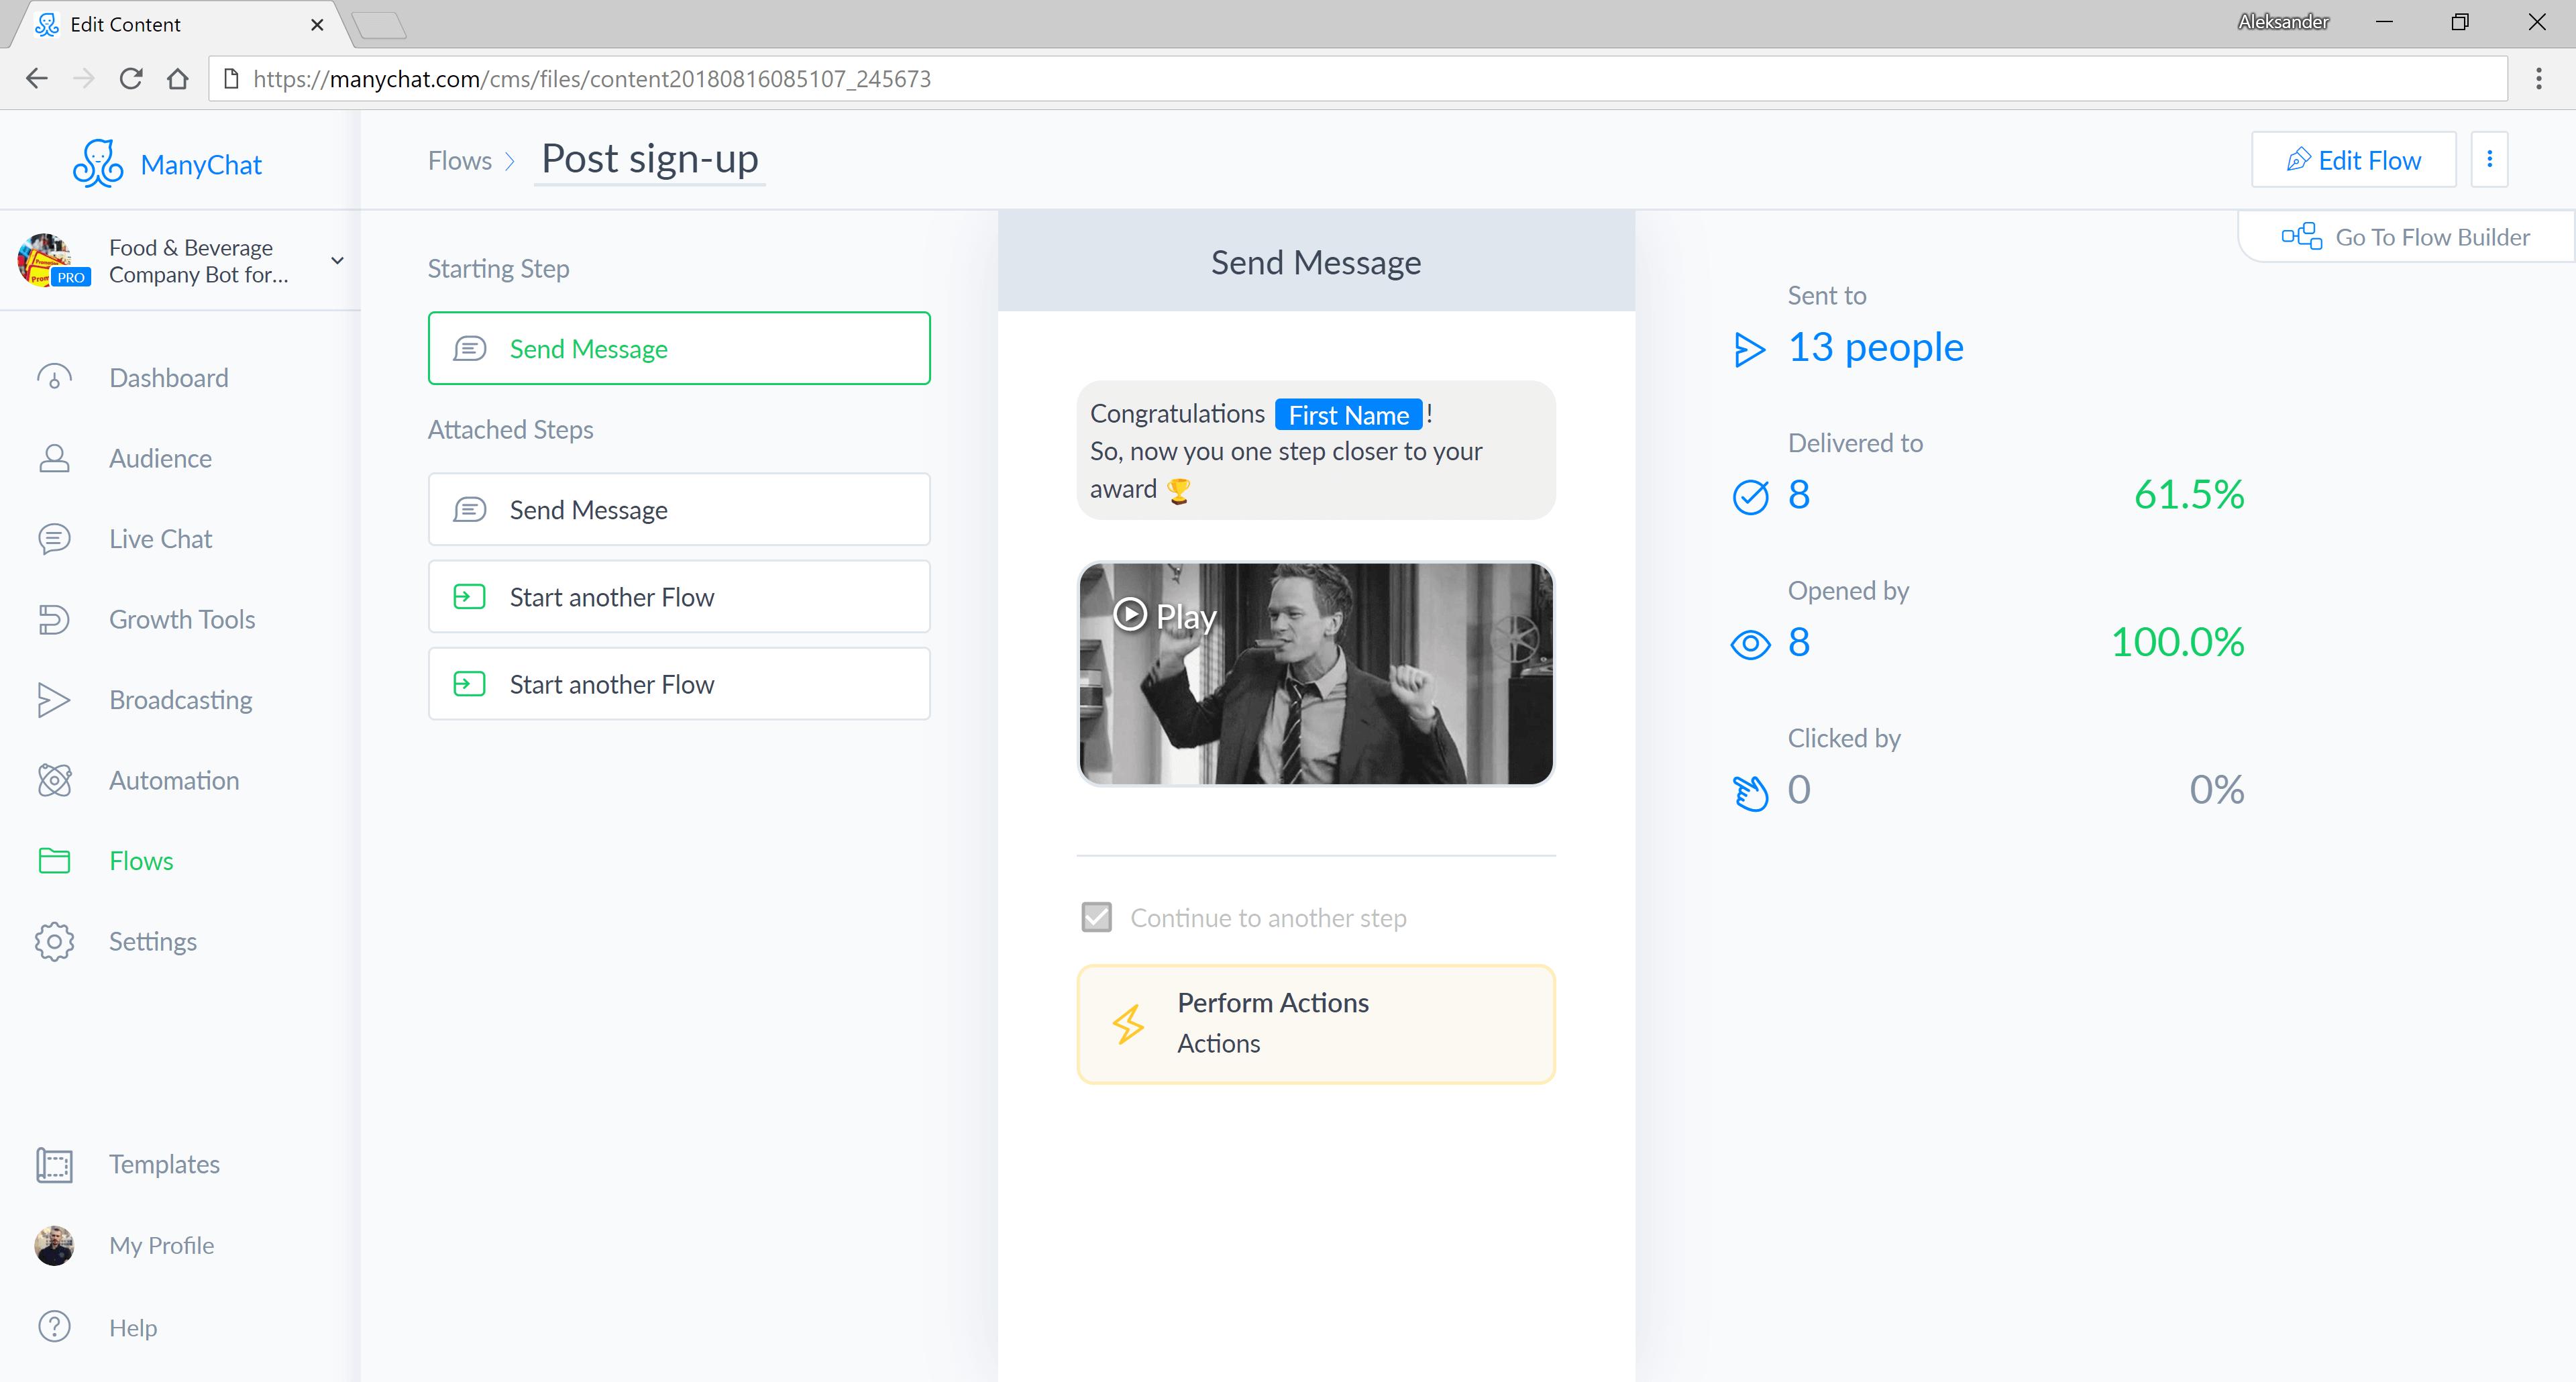 ManyChat flow editor screenshot for Food & Beverage Company Bot for Messenger